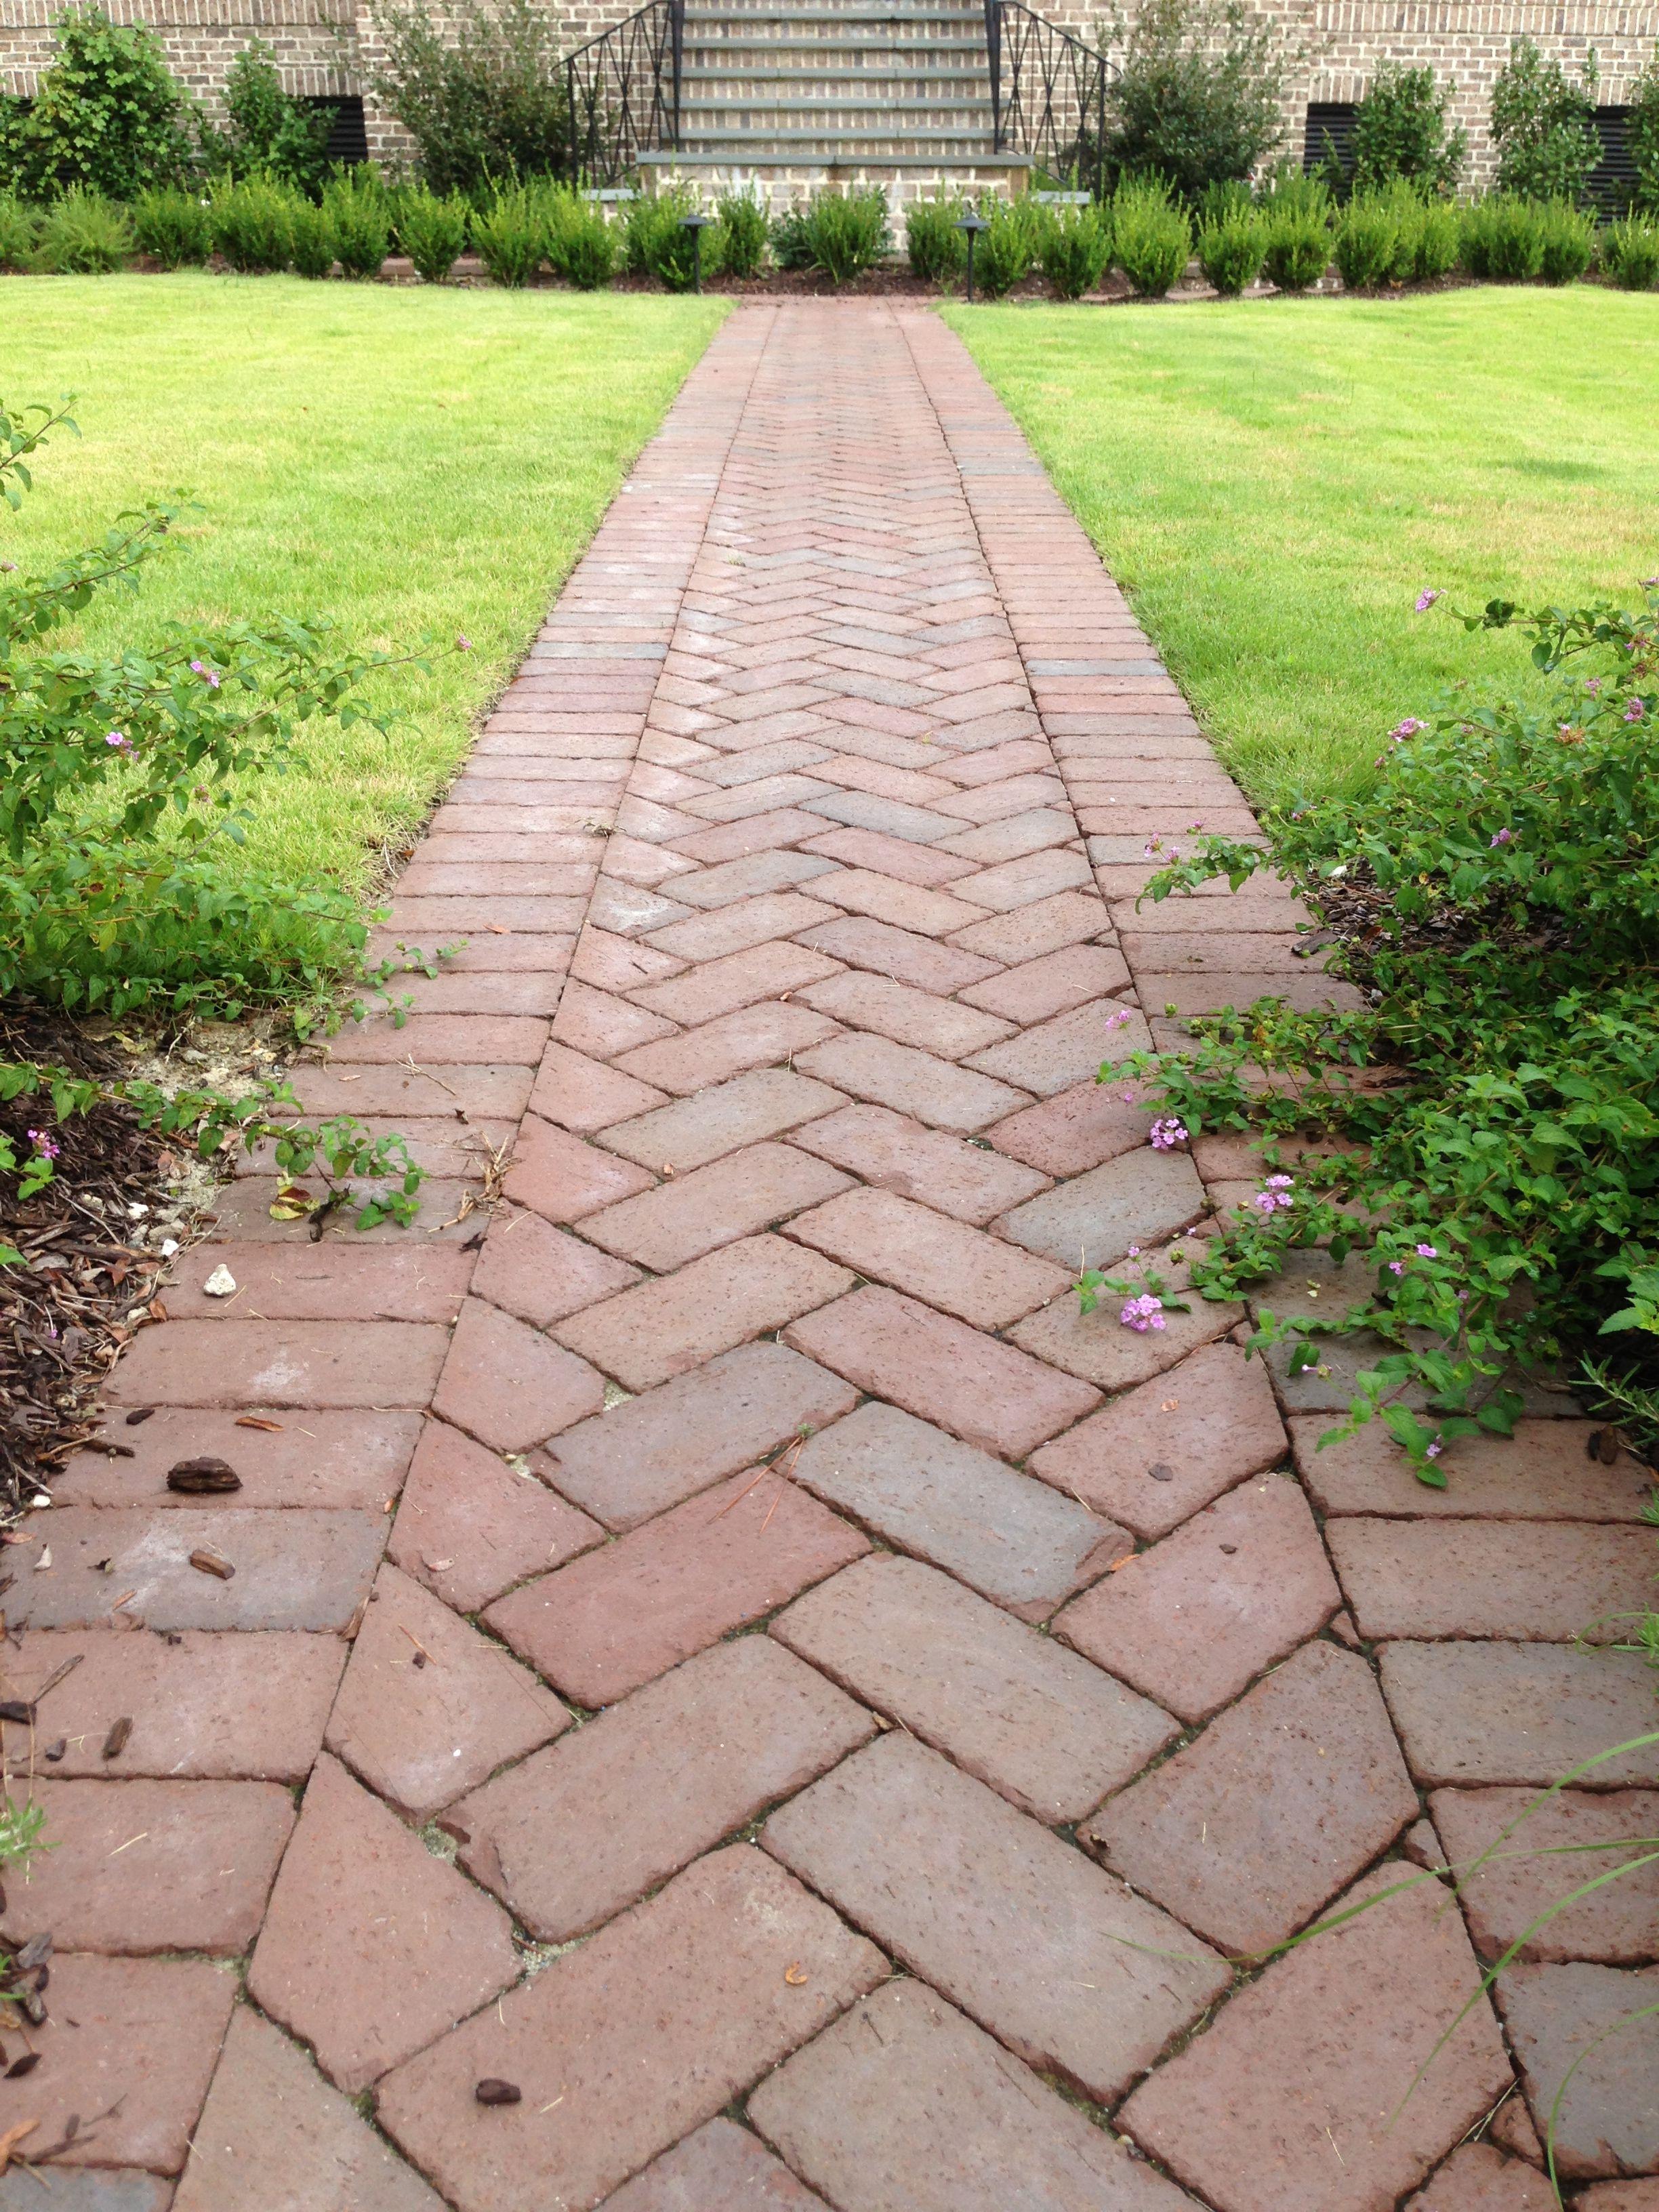 purington skinny pavers a rare find these narrow bricks were laid